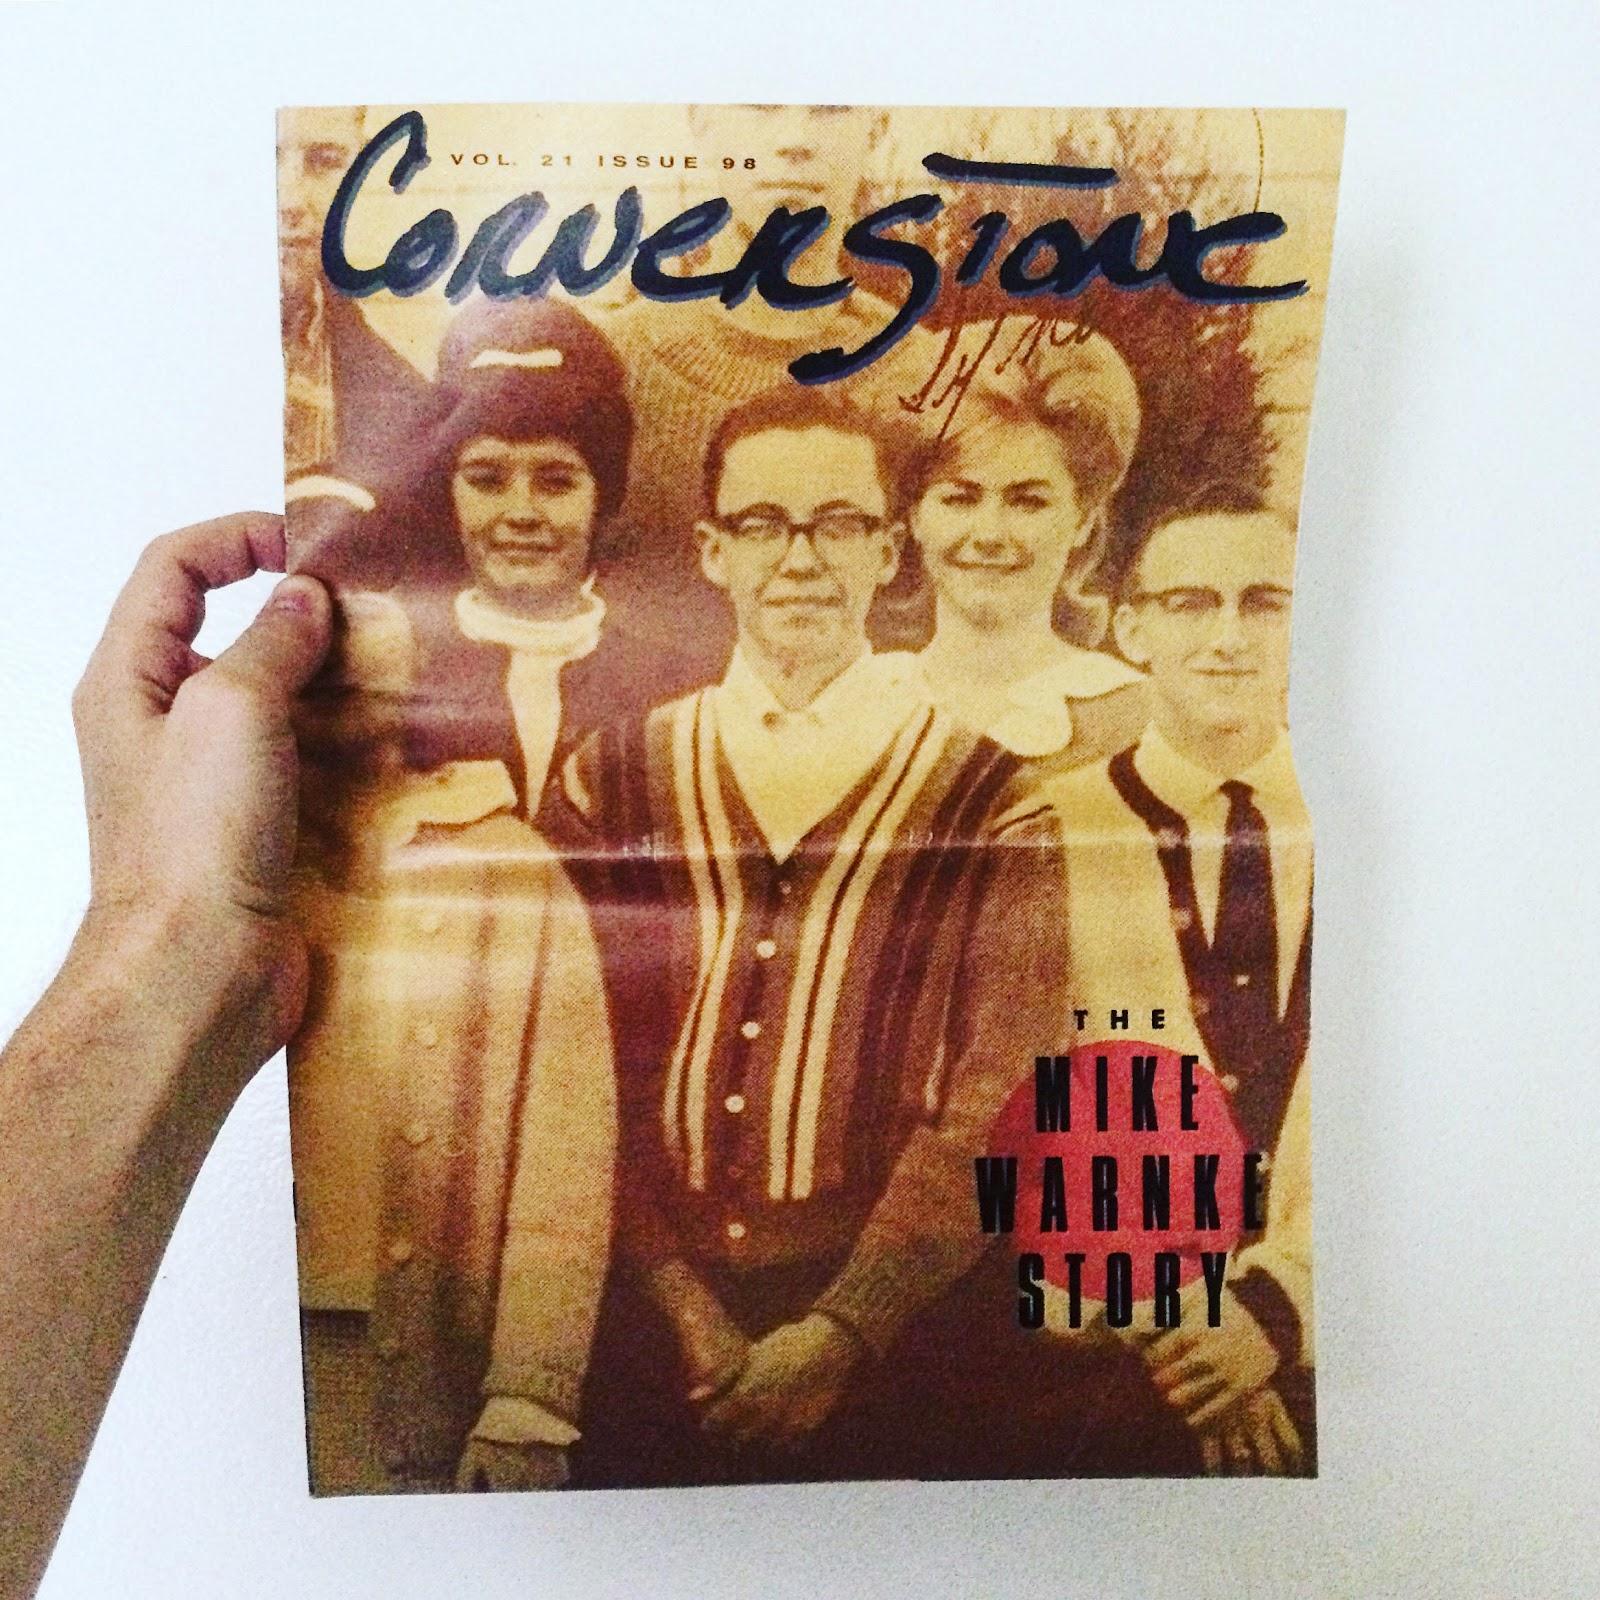 Cornerstone magazine, Volume 21, Issue 98 – 1992